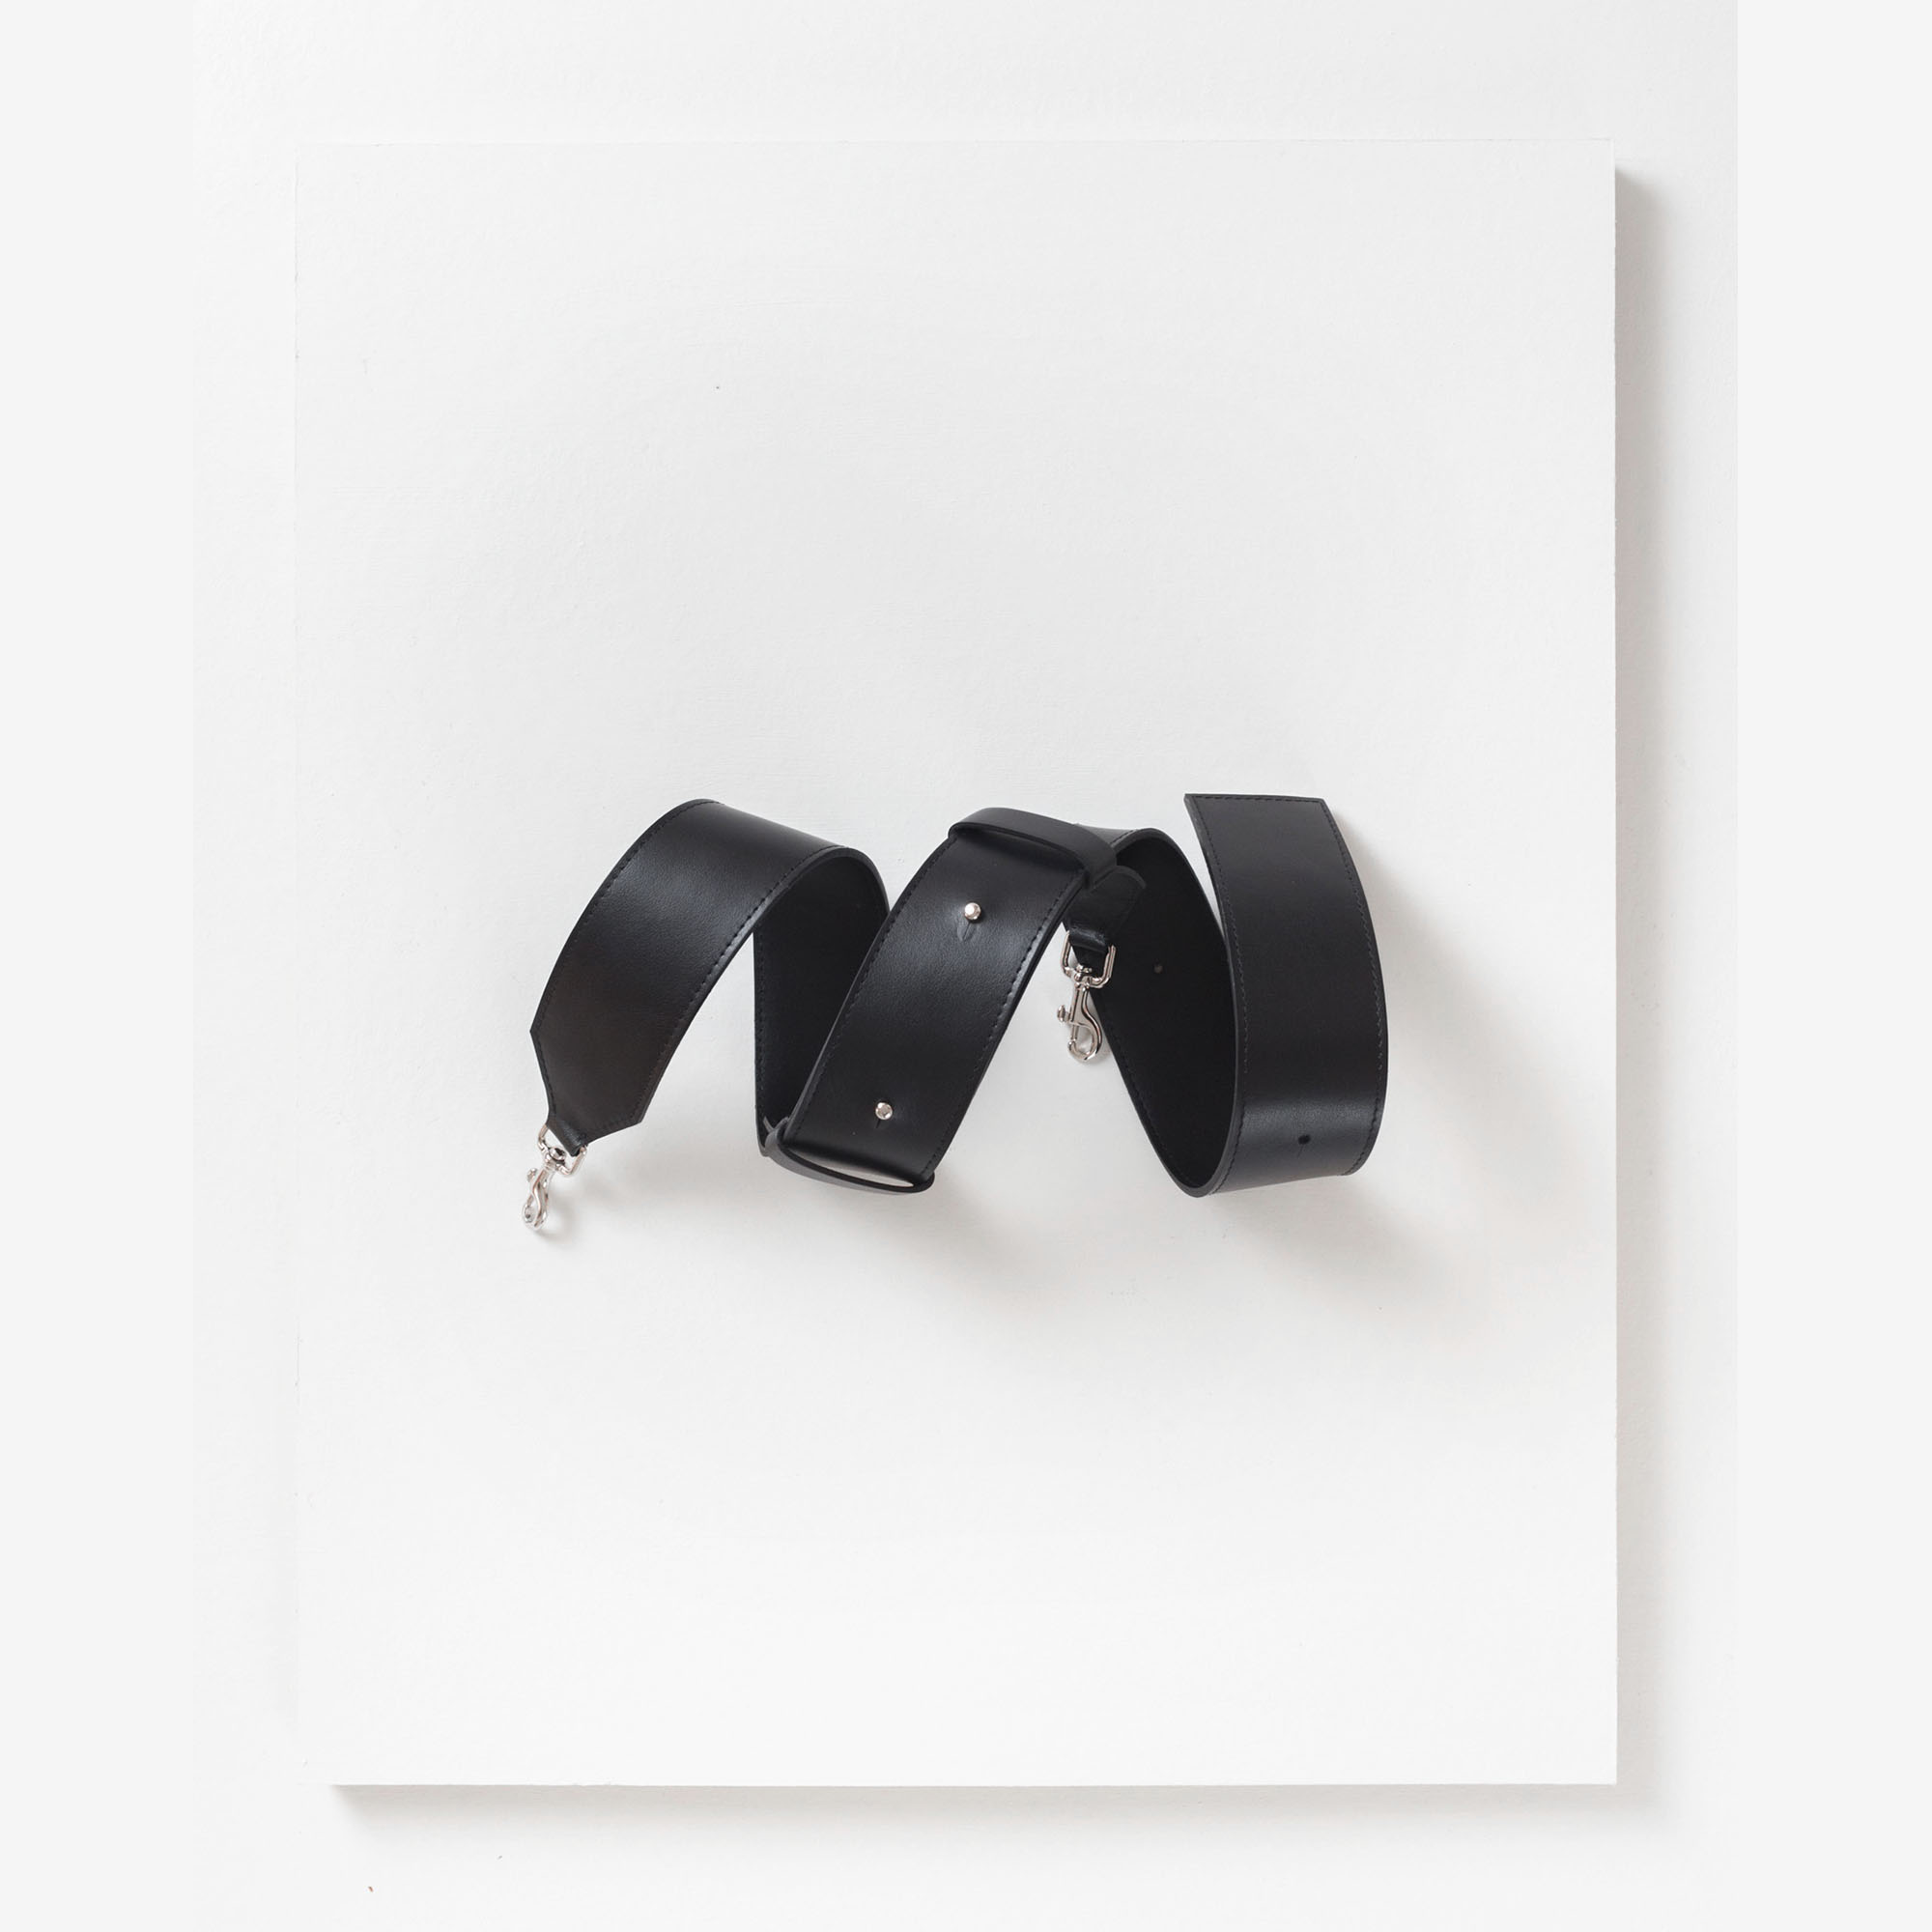 Laimushka black leather detachable handbag strap